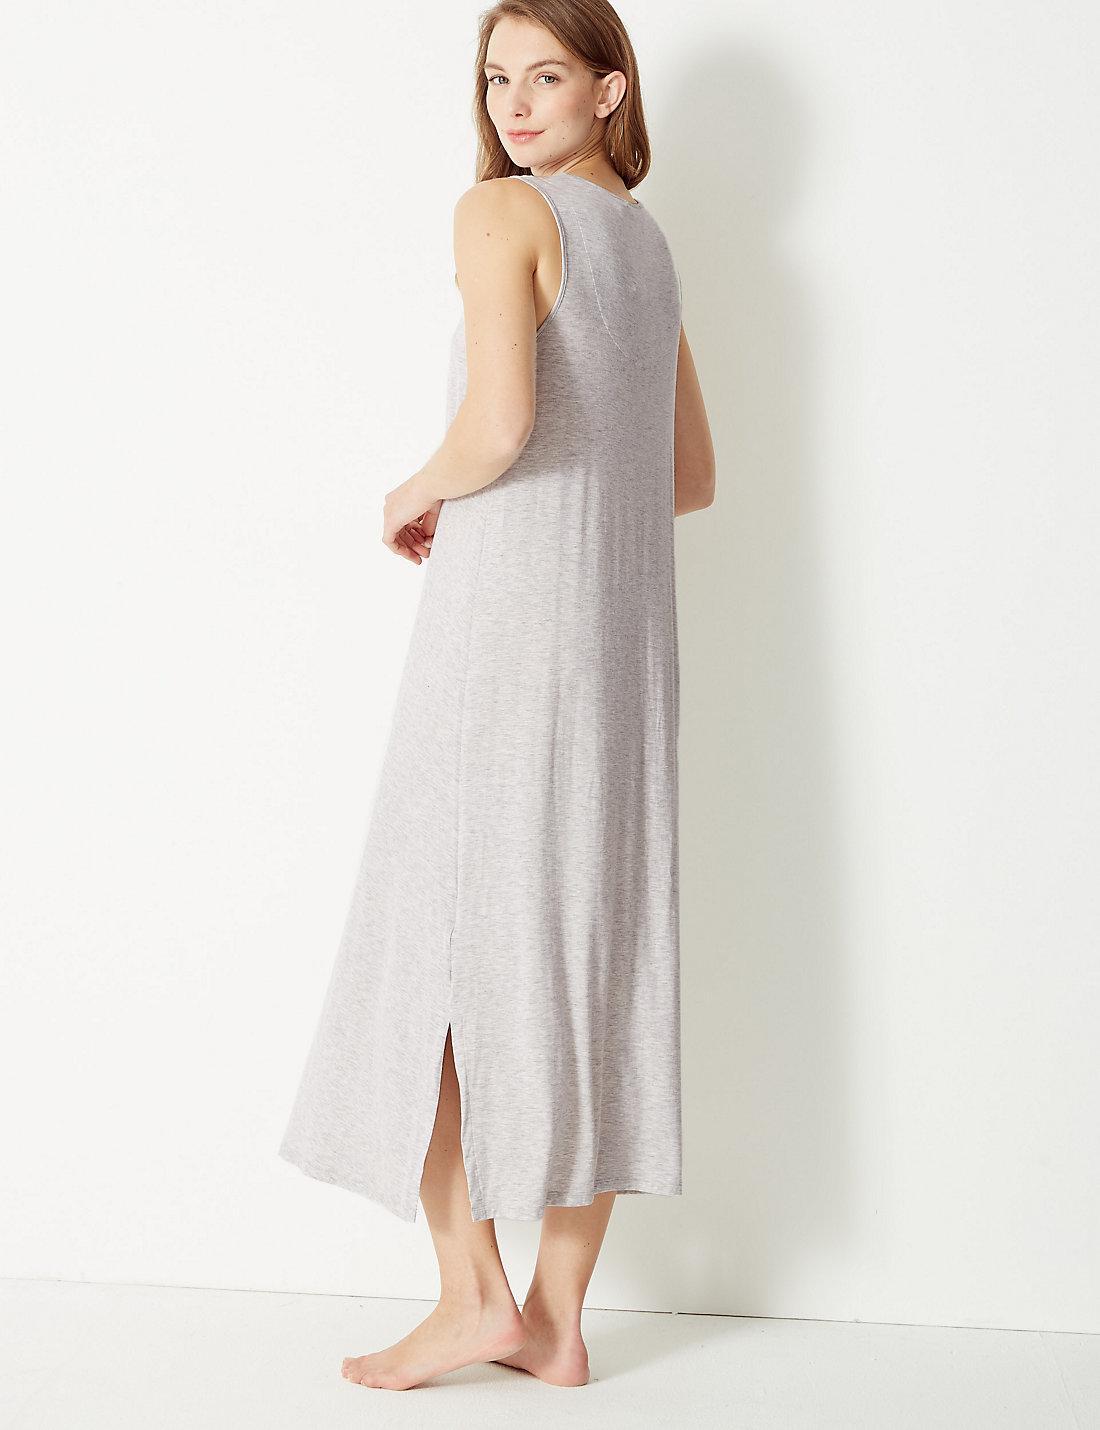 Lyst - Marks   Spencer Lace Trim Jersey Longer Length Nightdress in Gray 7189ffcbb